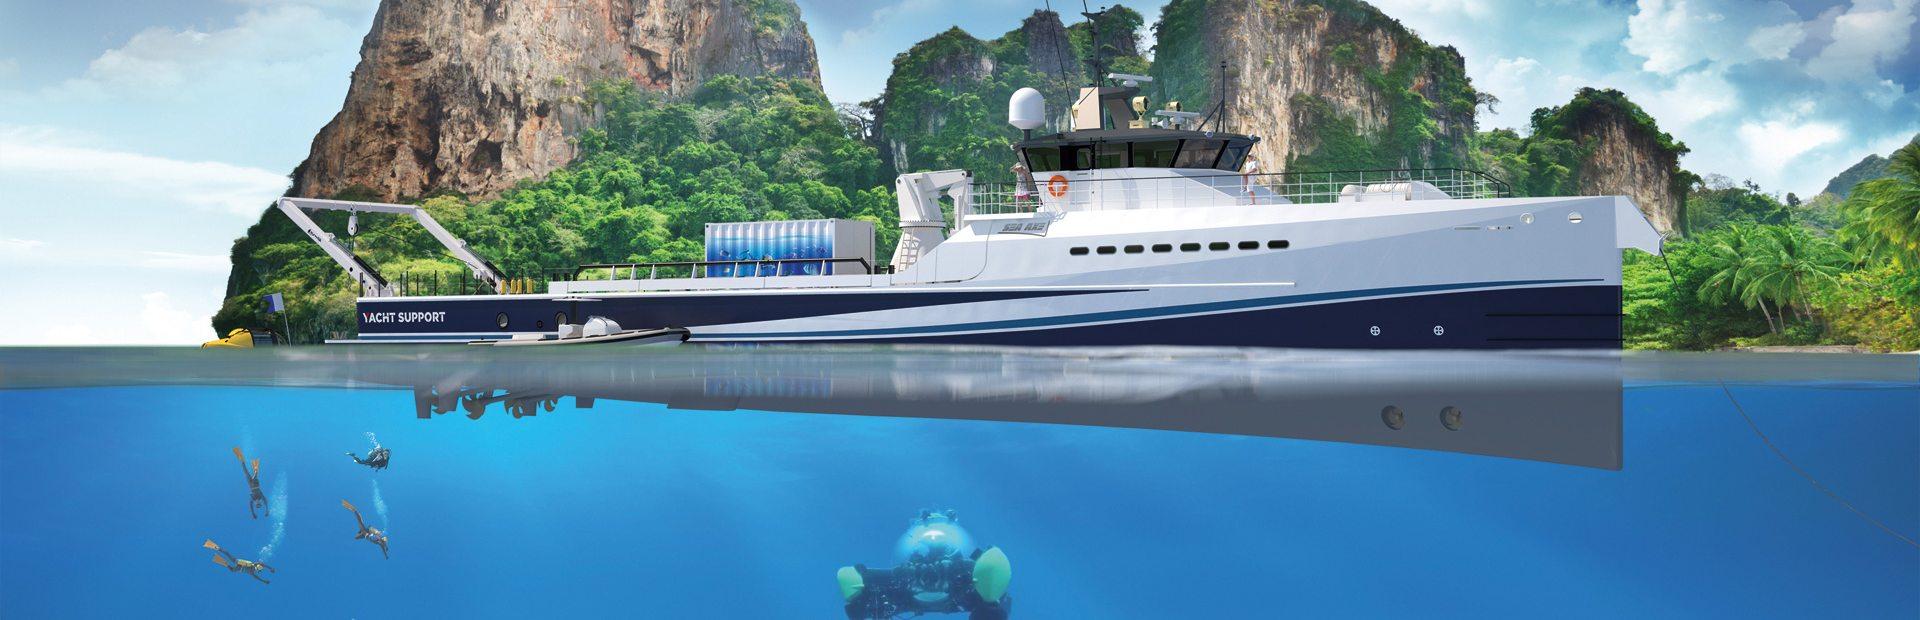 Damen YS 5009 Yacht Charter